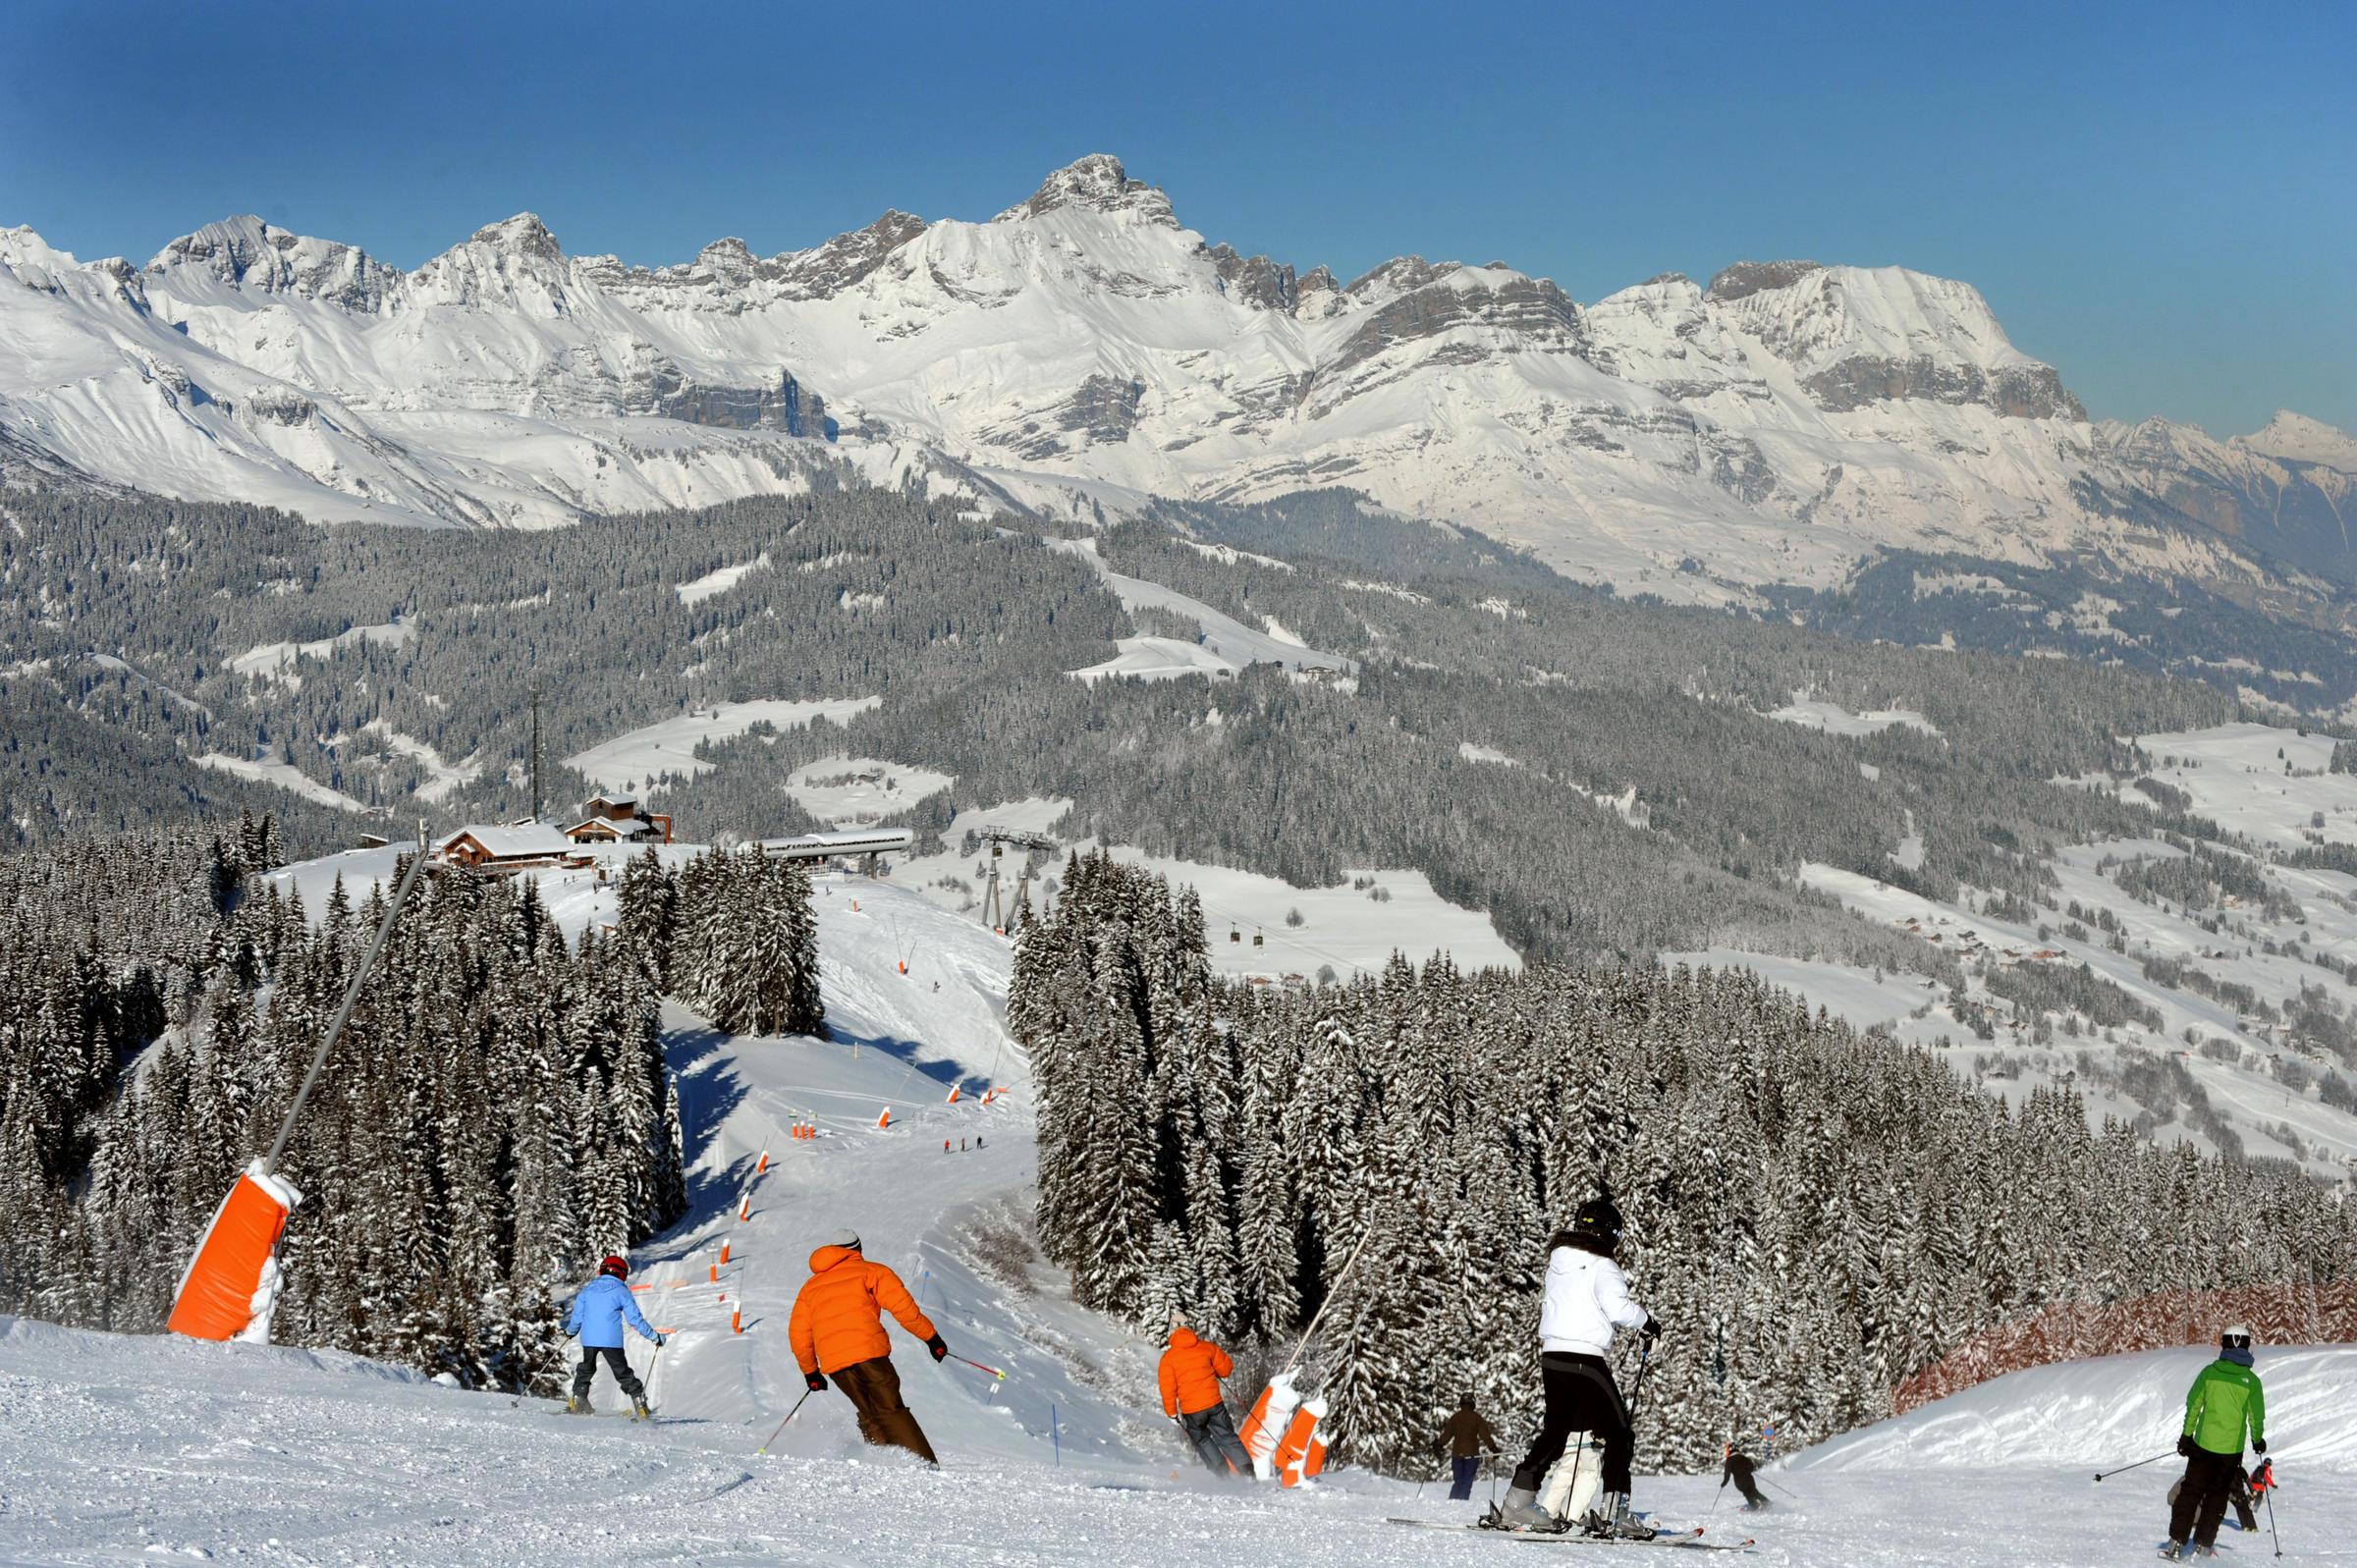 Russian Economic Woes Hit Frances Ski Slopes  KCUR